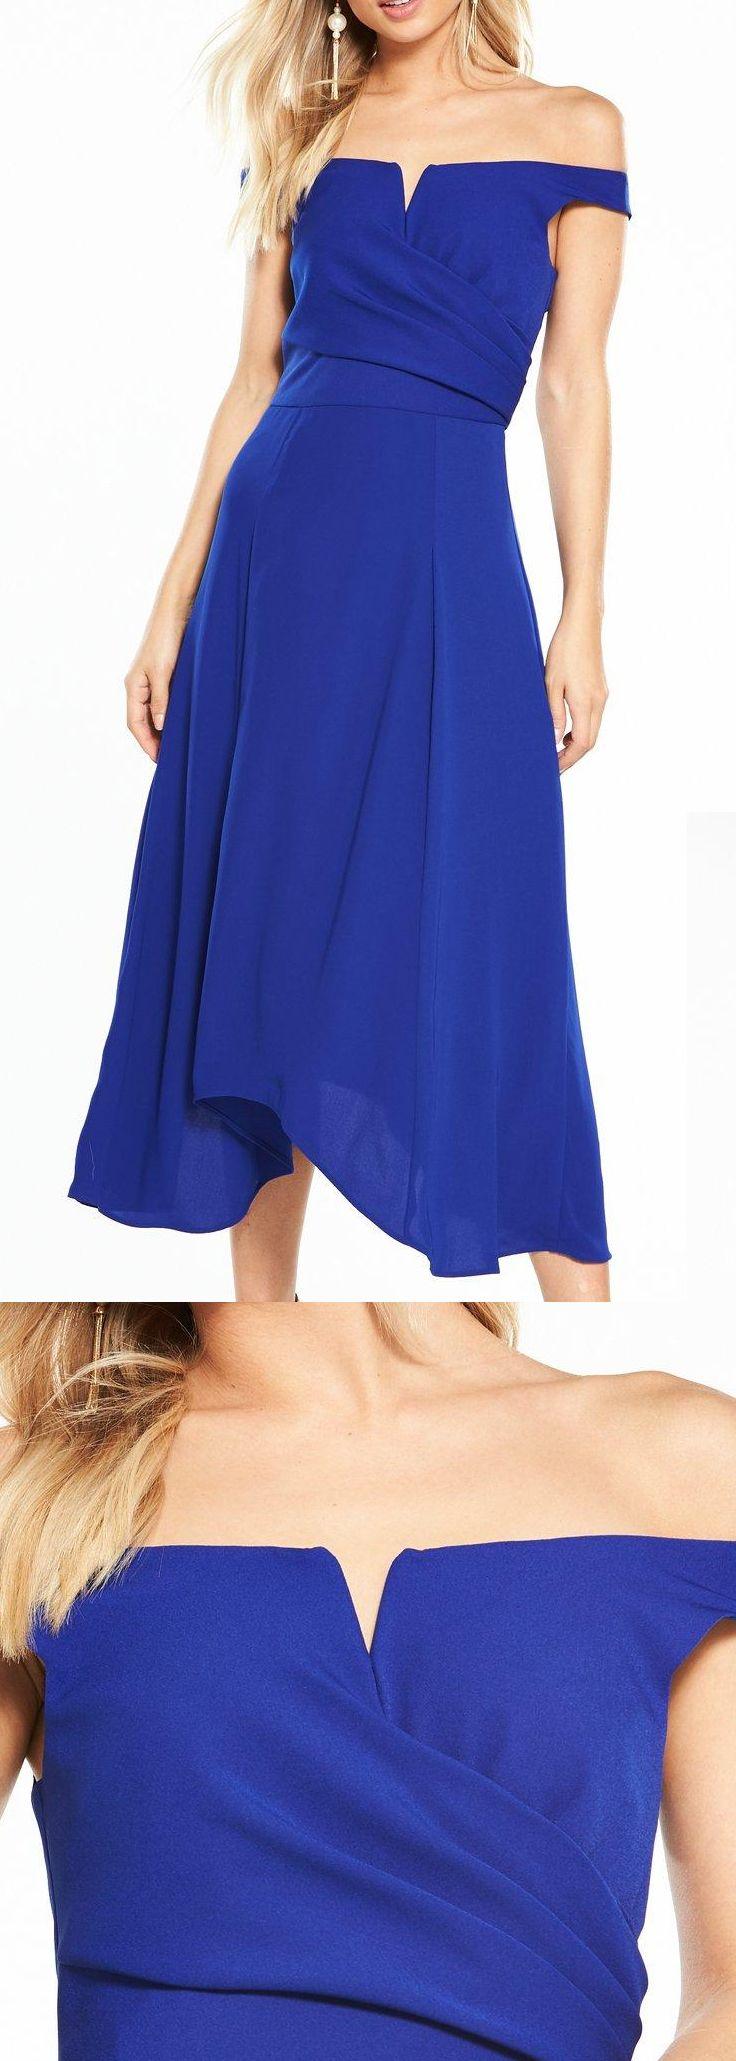 Cobalt blue bridesmaids dress love the on trend bardot dress by